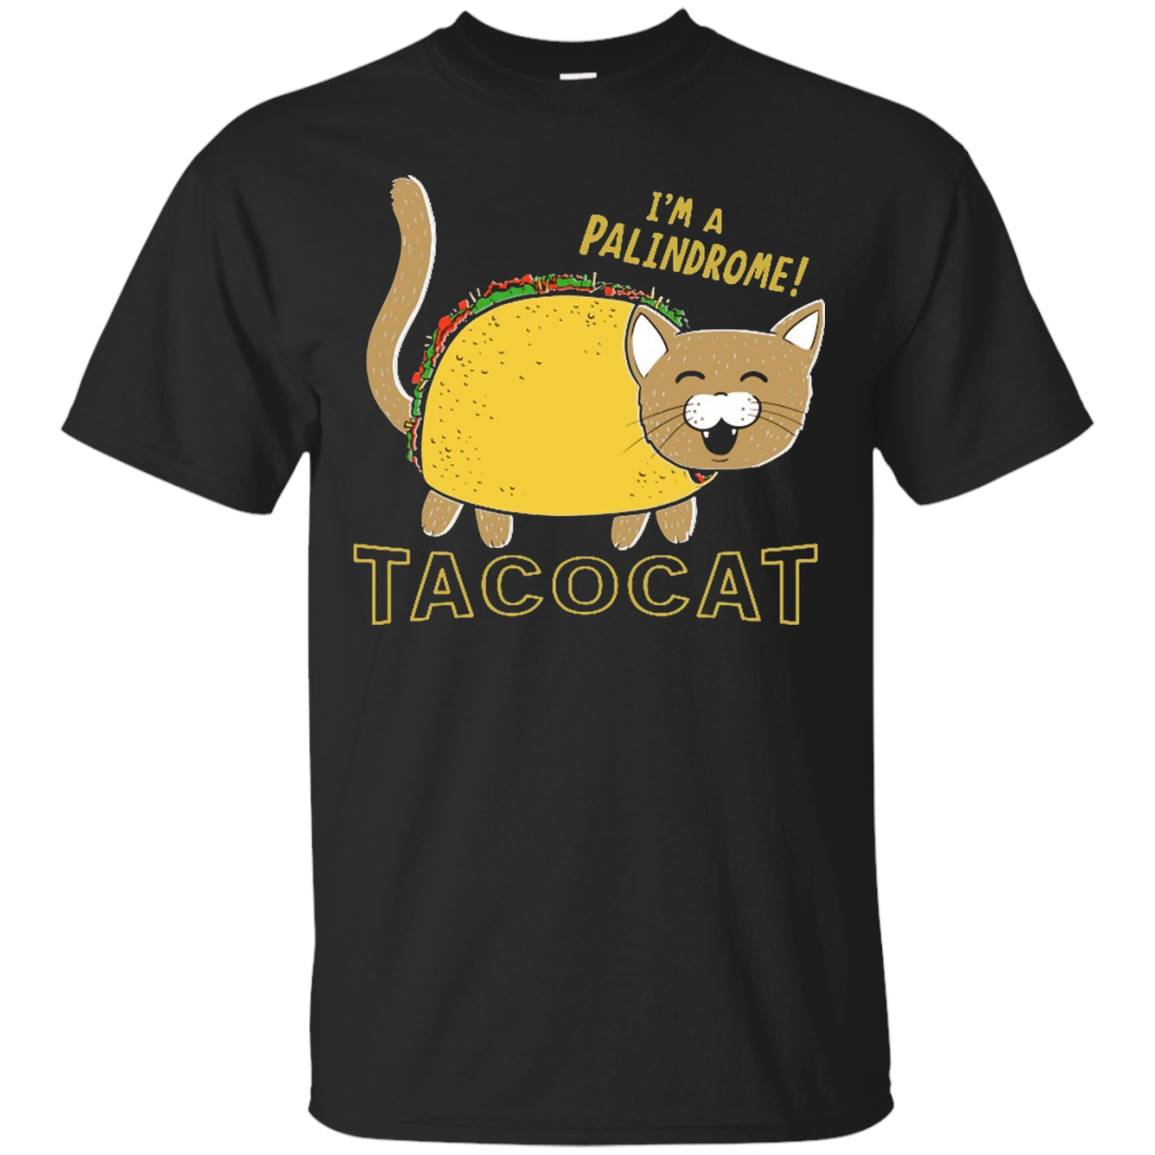 TACOCAT Palindrome Cartoon Funny Taco Cat Shirt